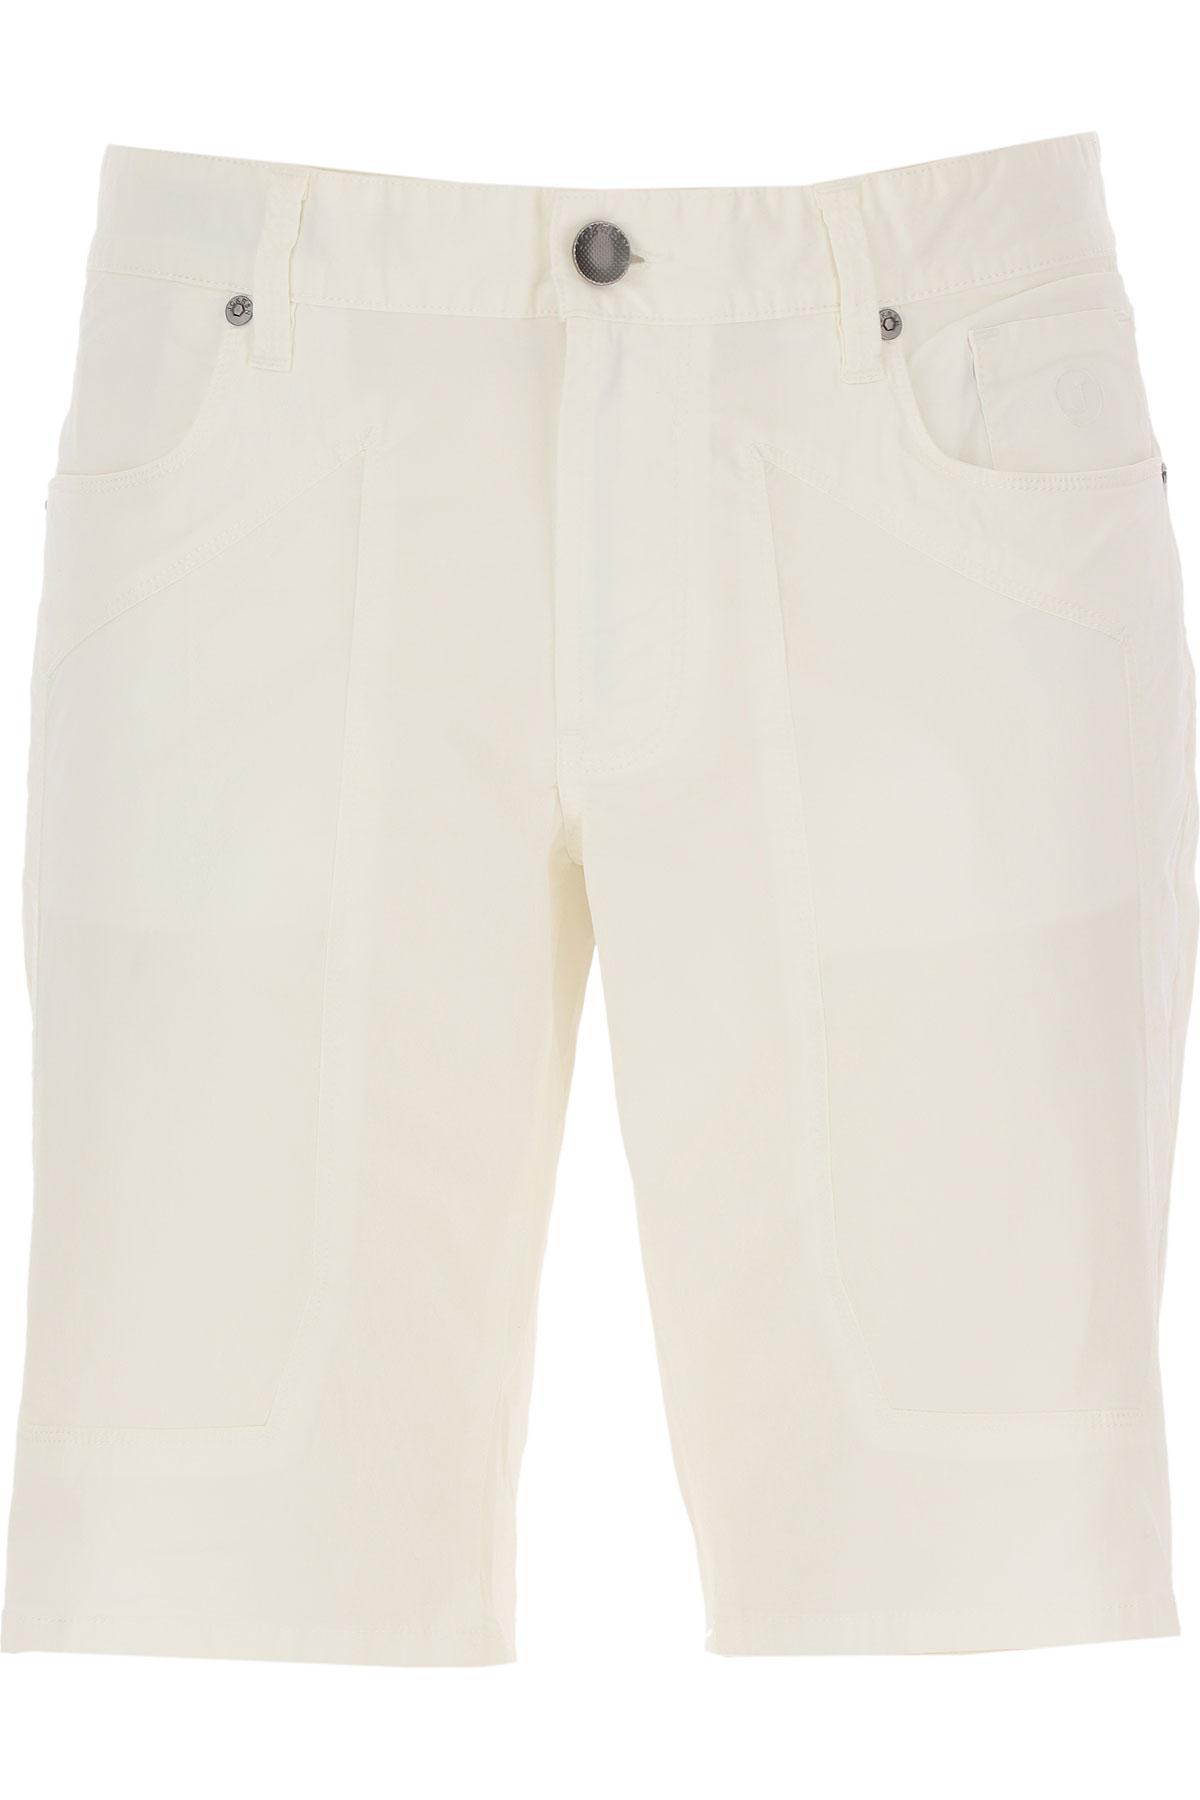 Jeckerson Shorts for Men On Sale, White, Cotton, 2019, 30 31 34 35 36